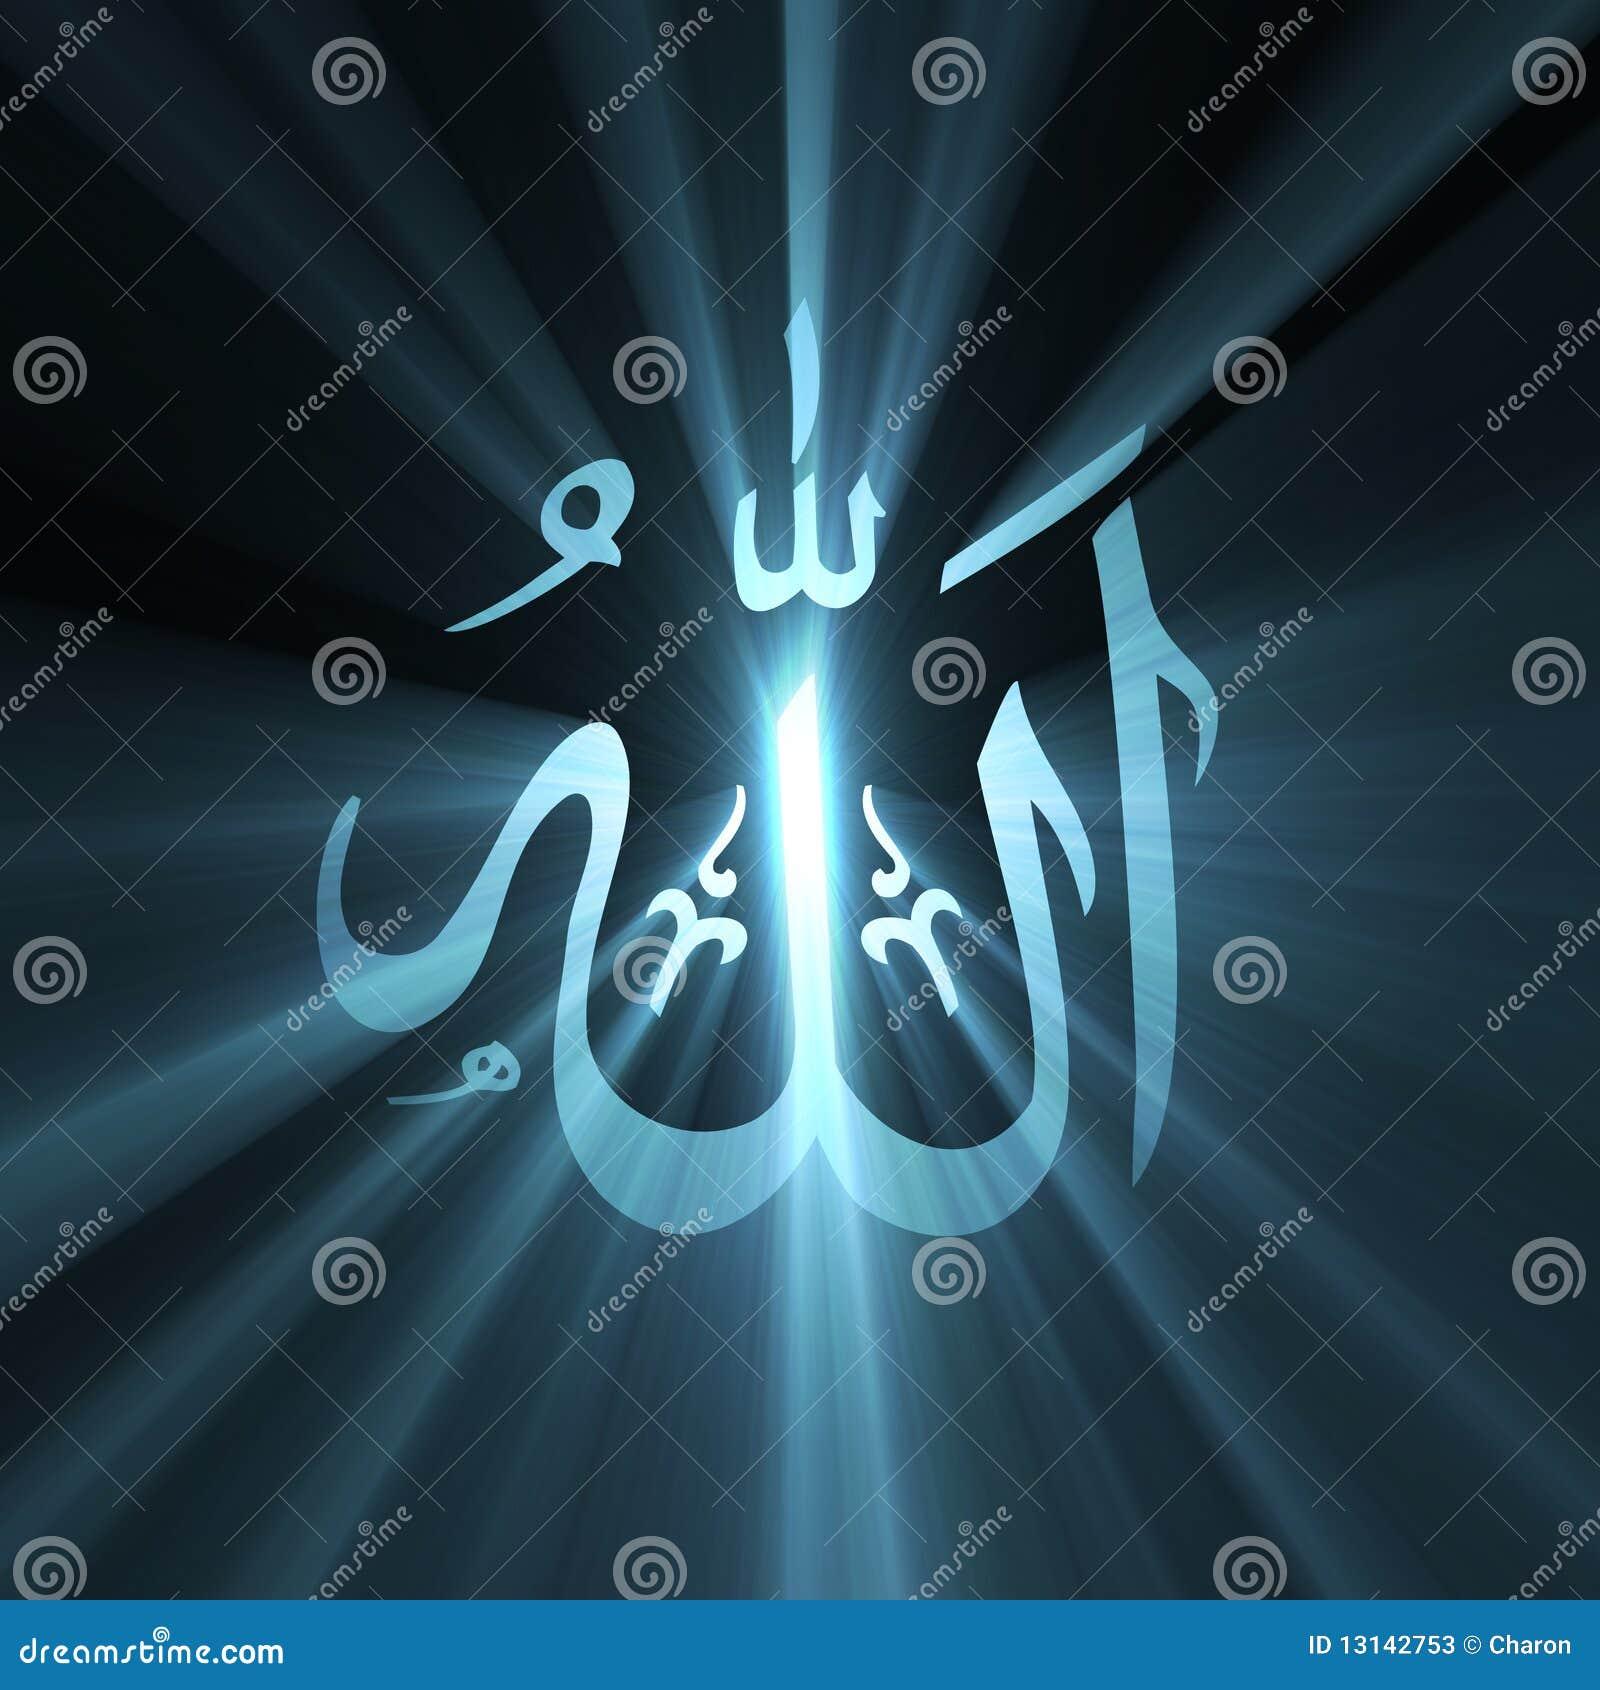 Allah Arabic Symbol Light Flare Stock Photos - Image: 13142753